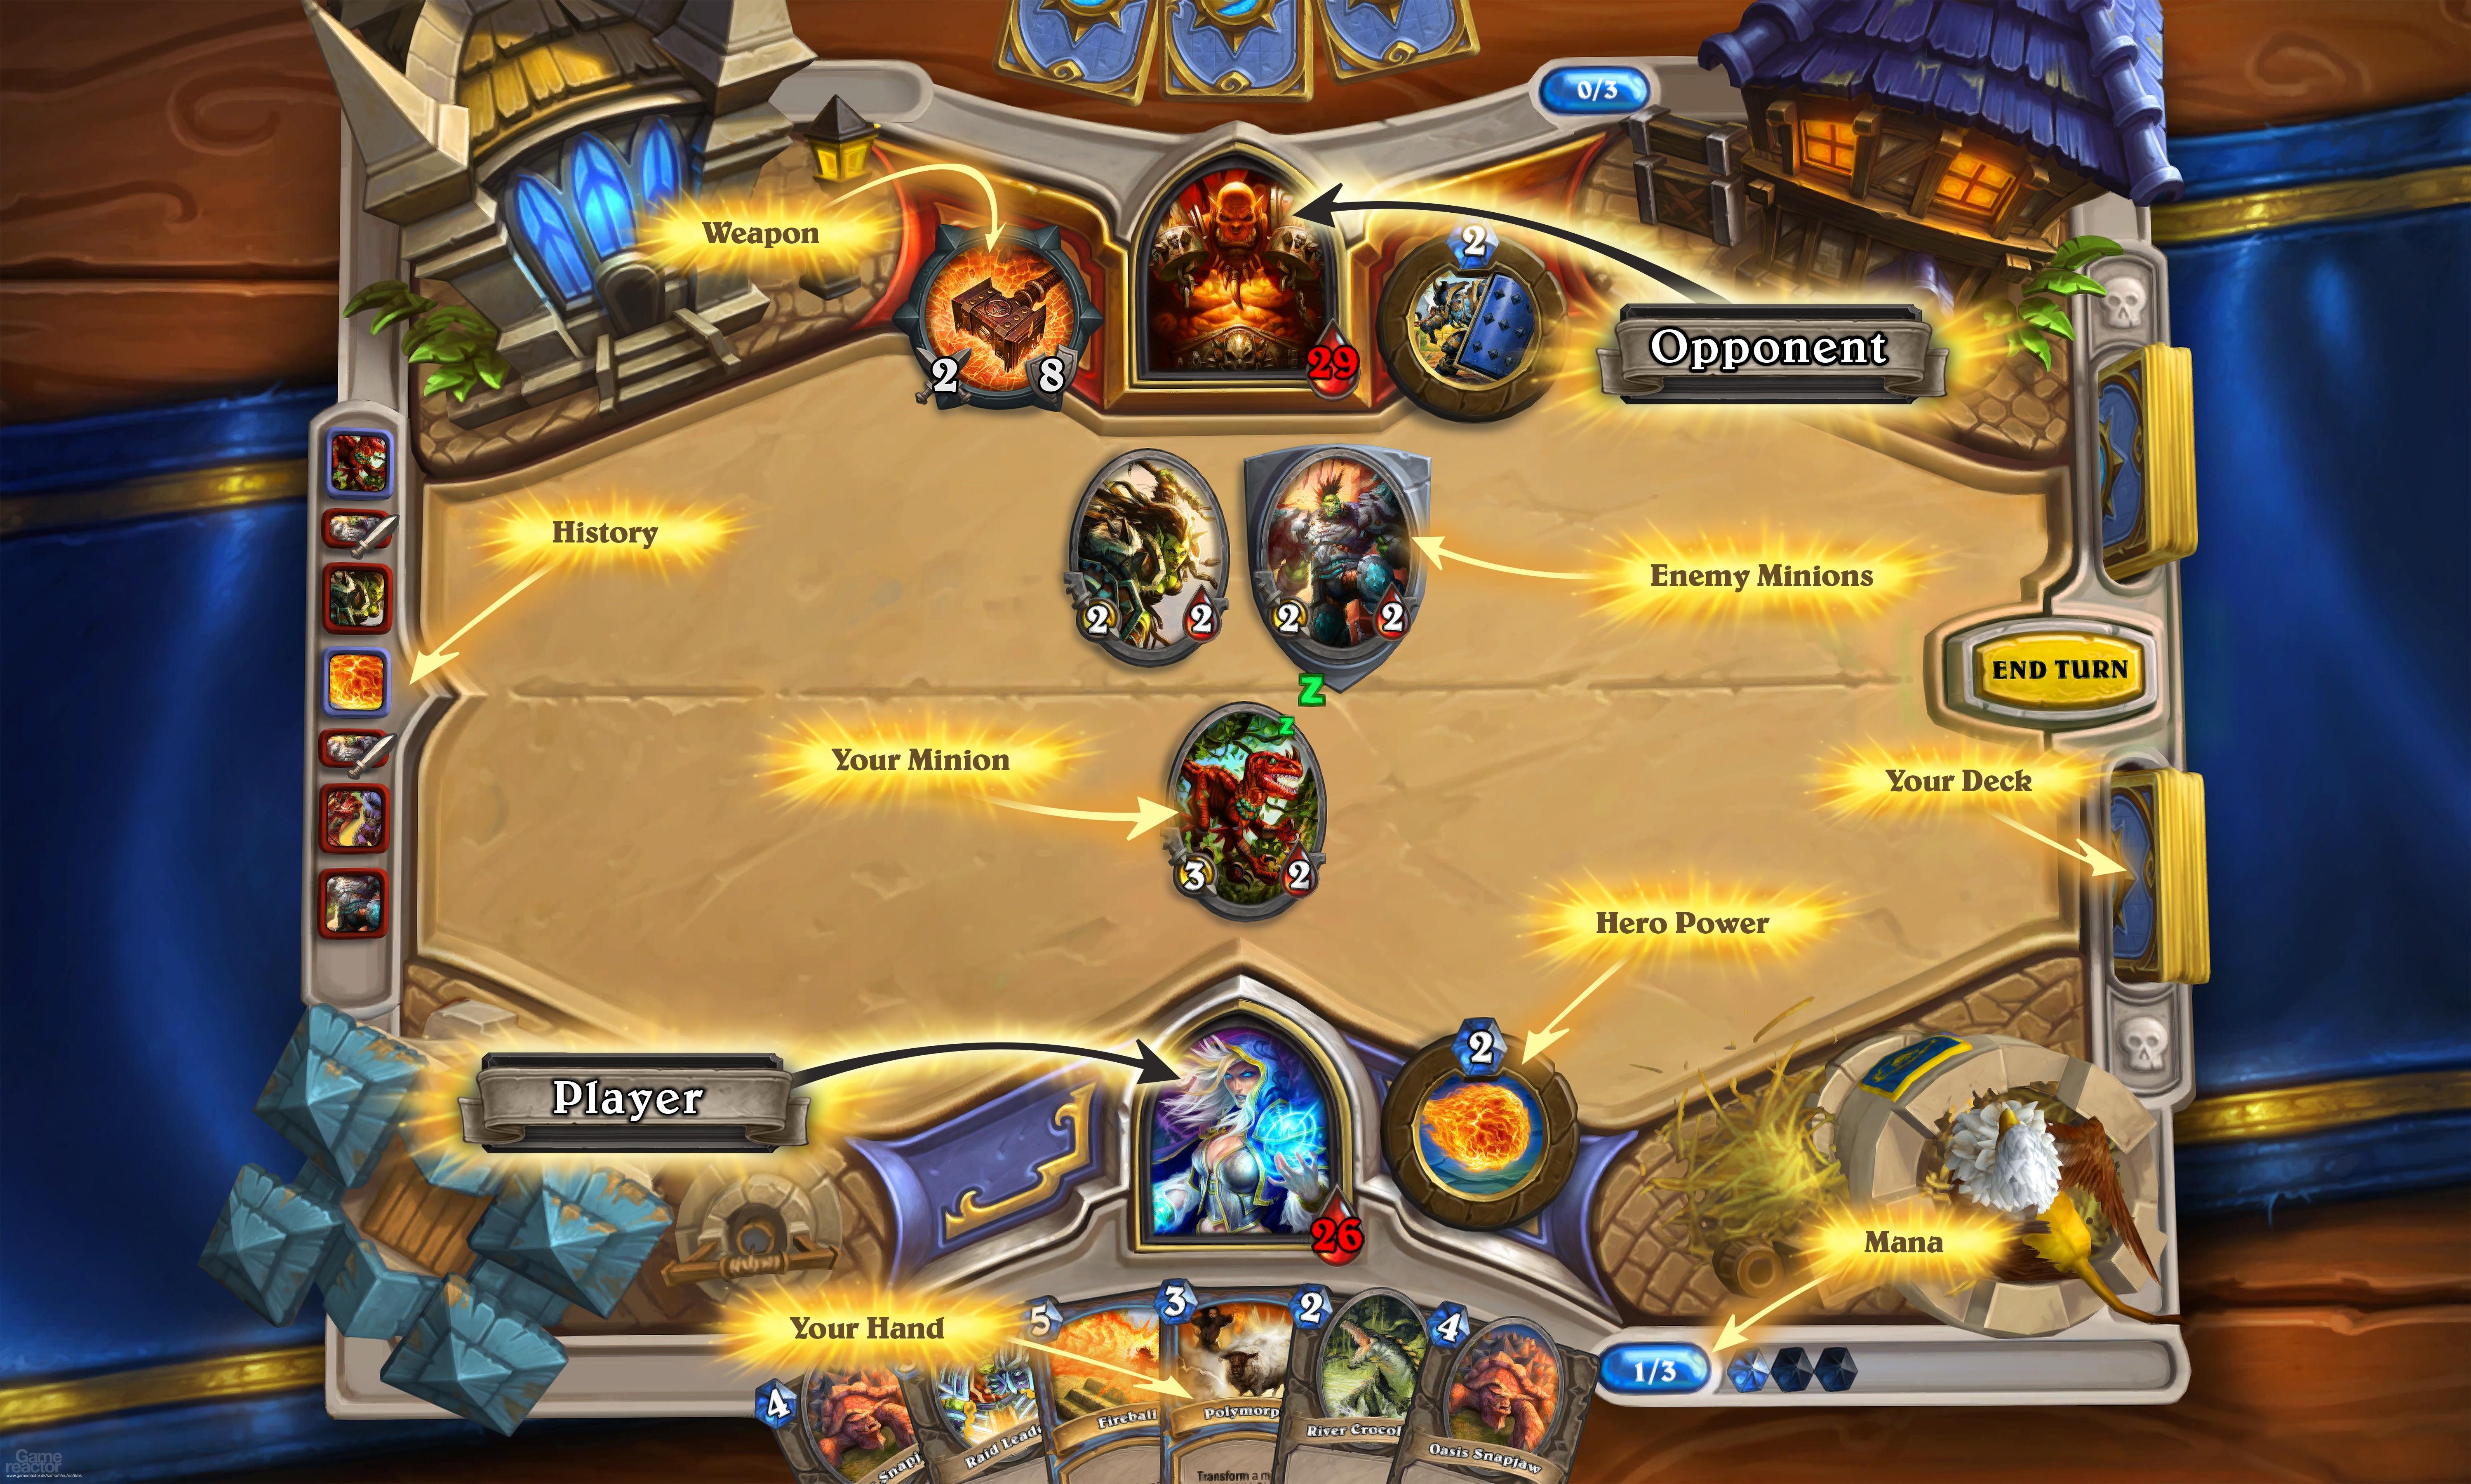 Скриншот к игре Hearthstone Heroes of Warcraft.